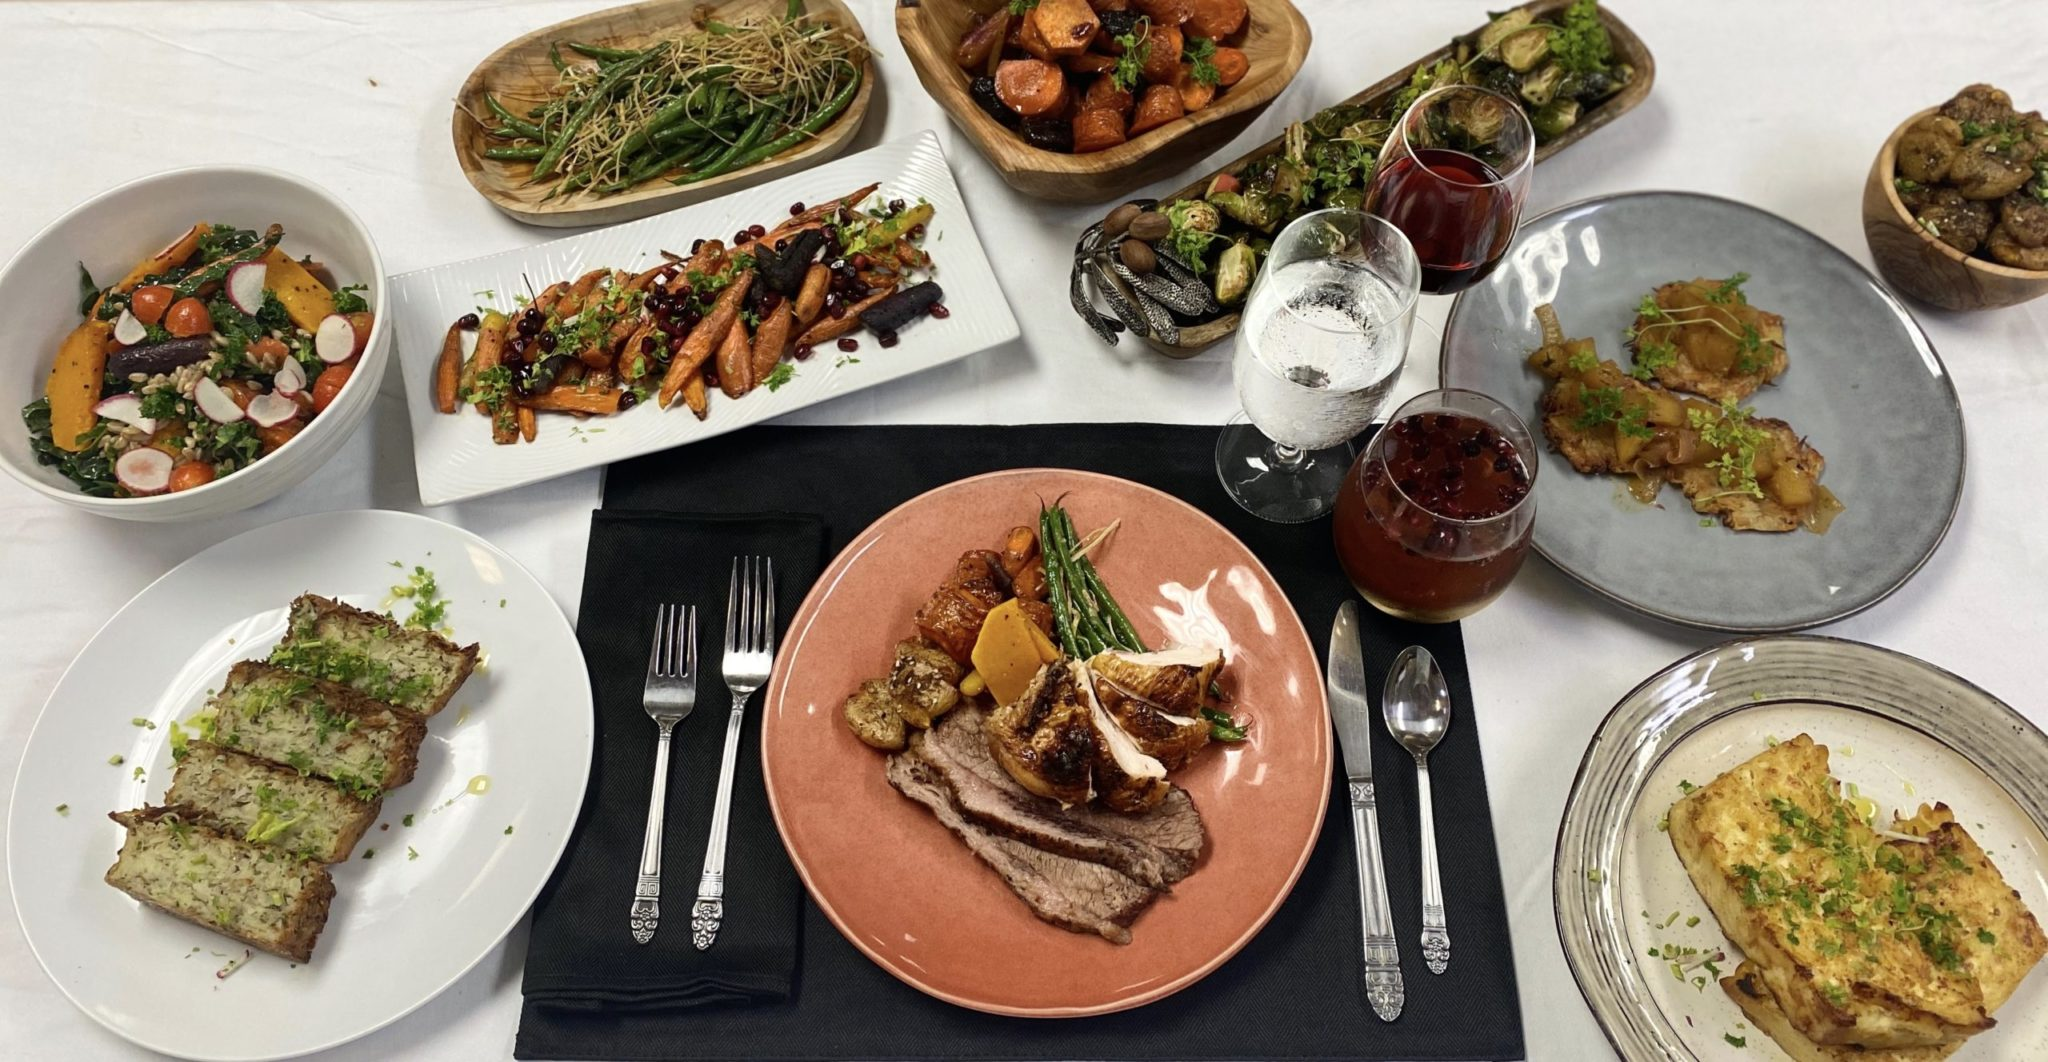 South Florida Rosh Hashanah meals